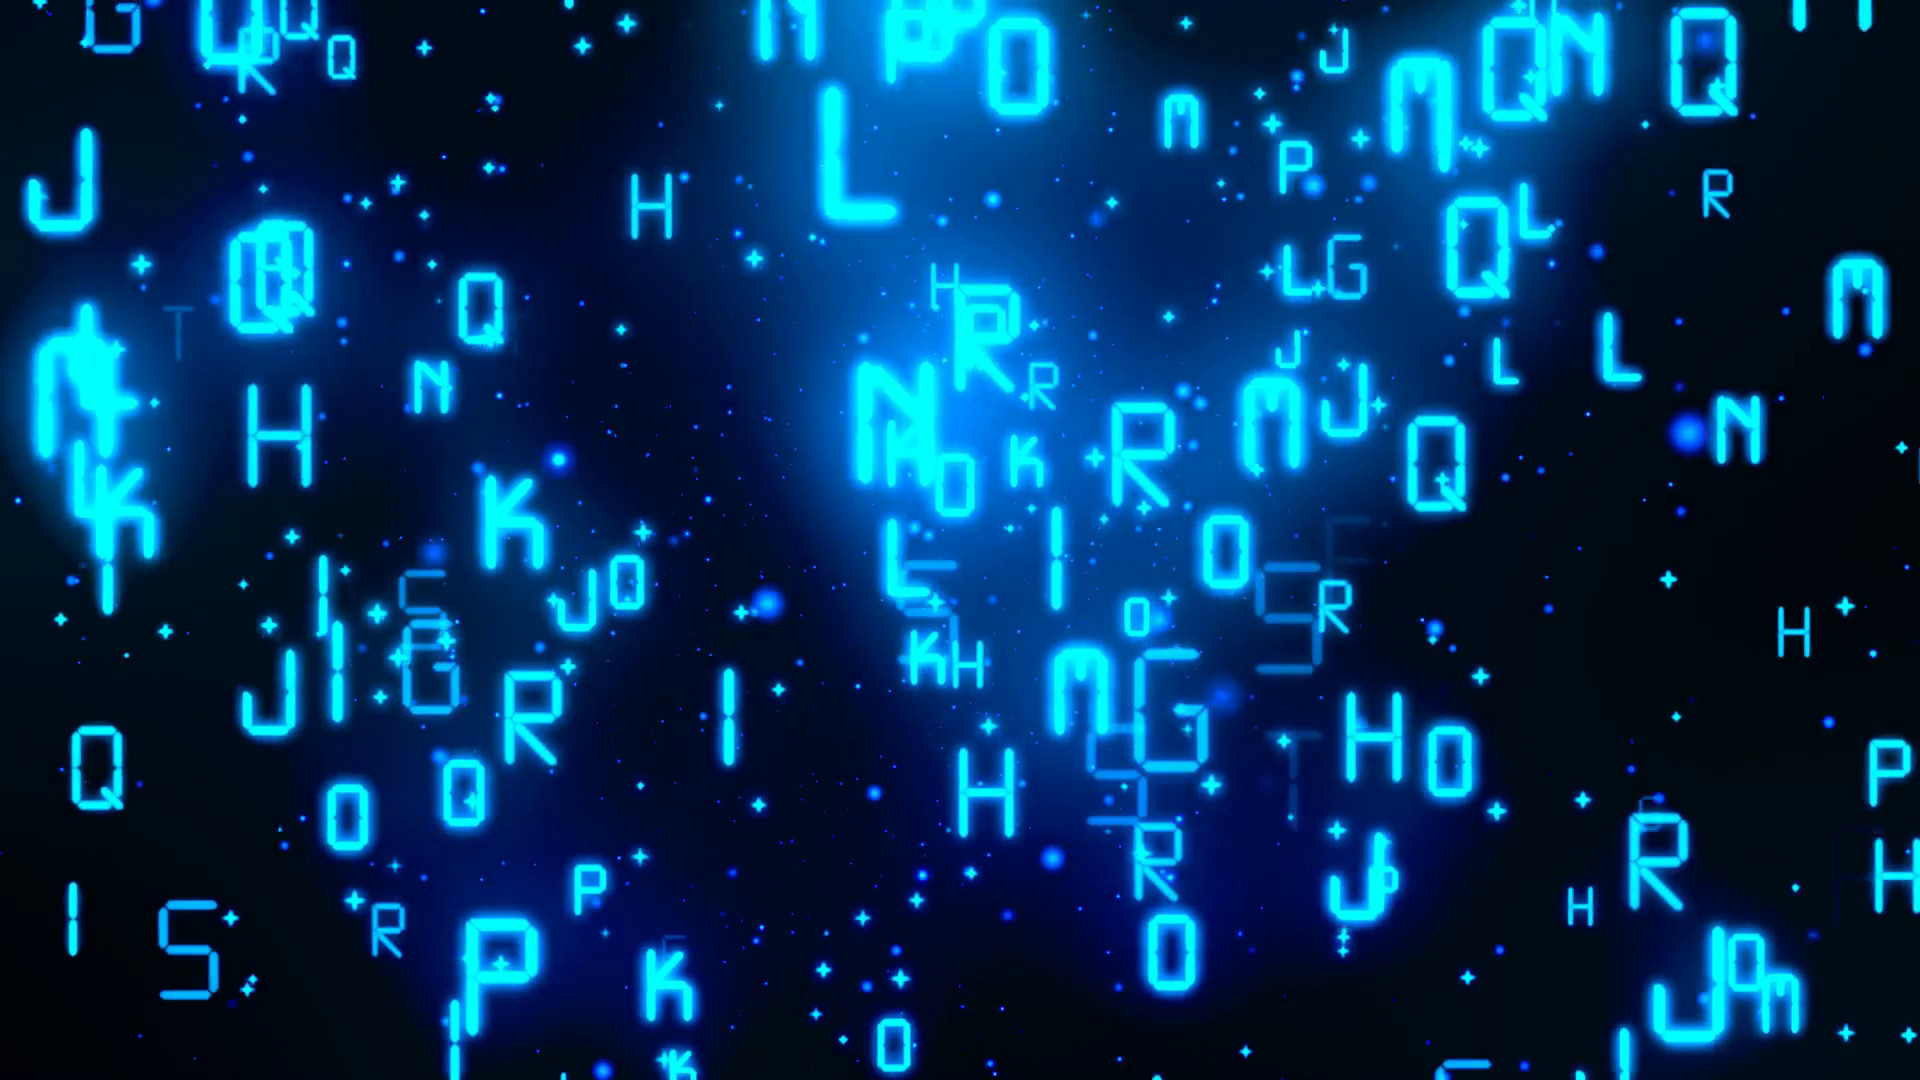 Matrix Digital Alphabets 2 Loopable Background Motion Background –  VideoBlocks